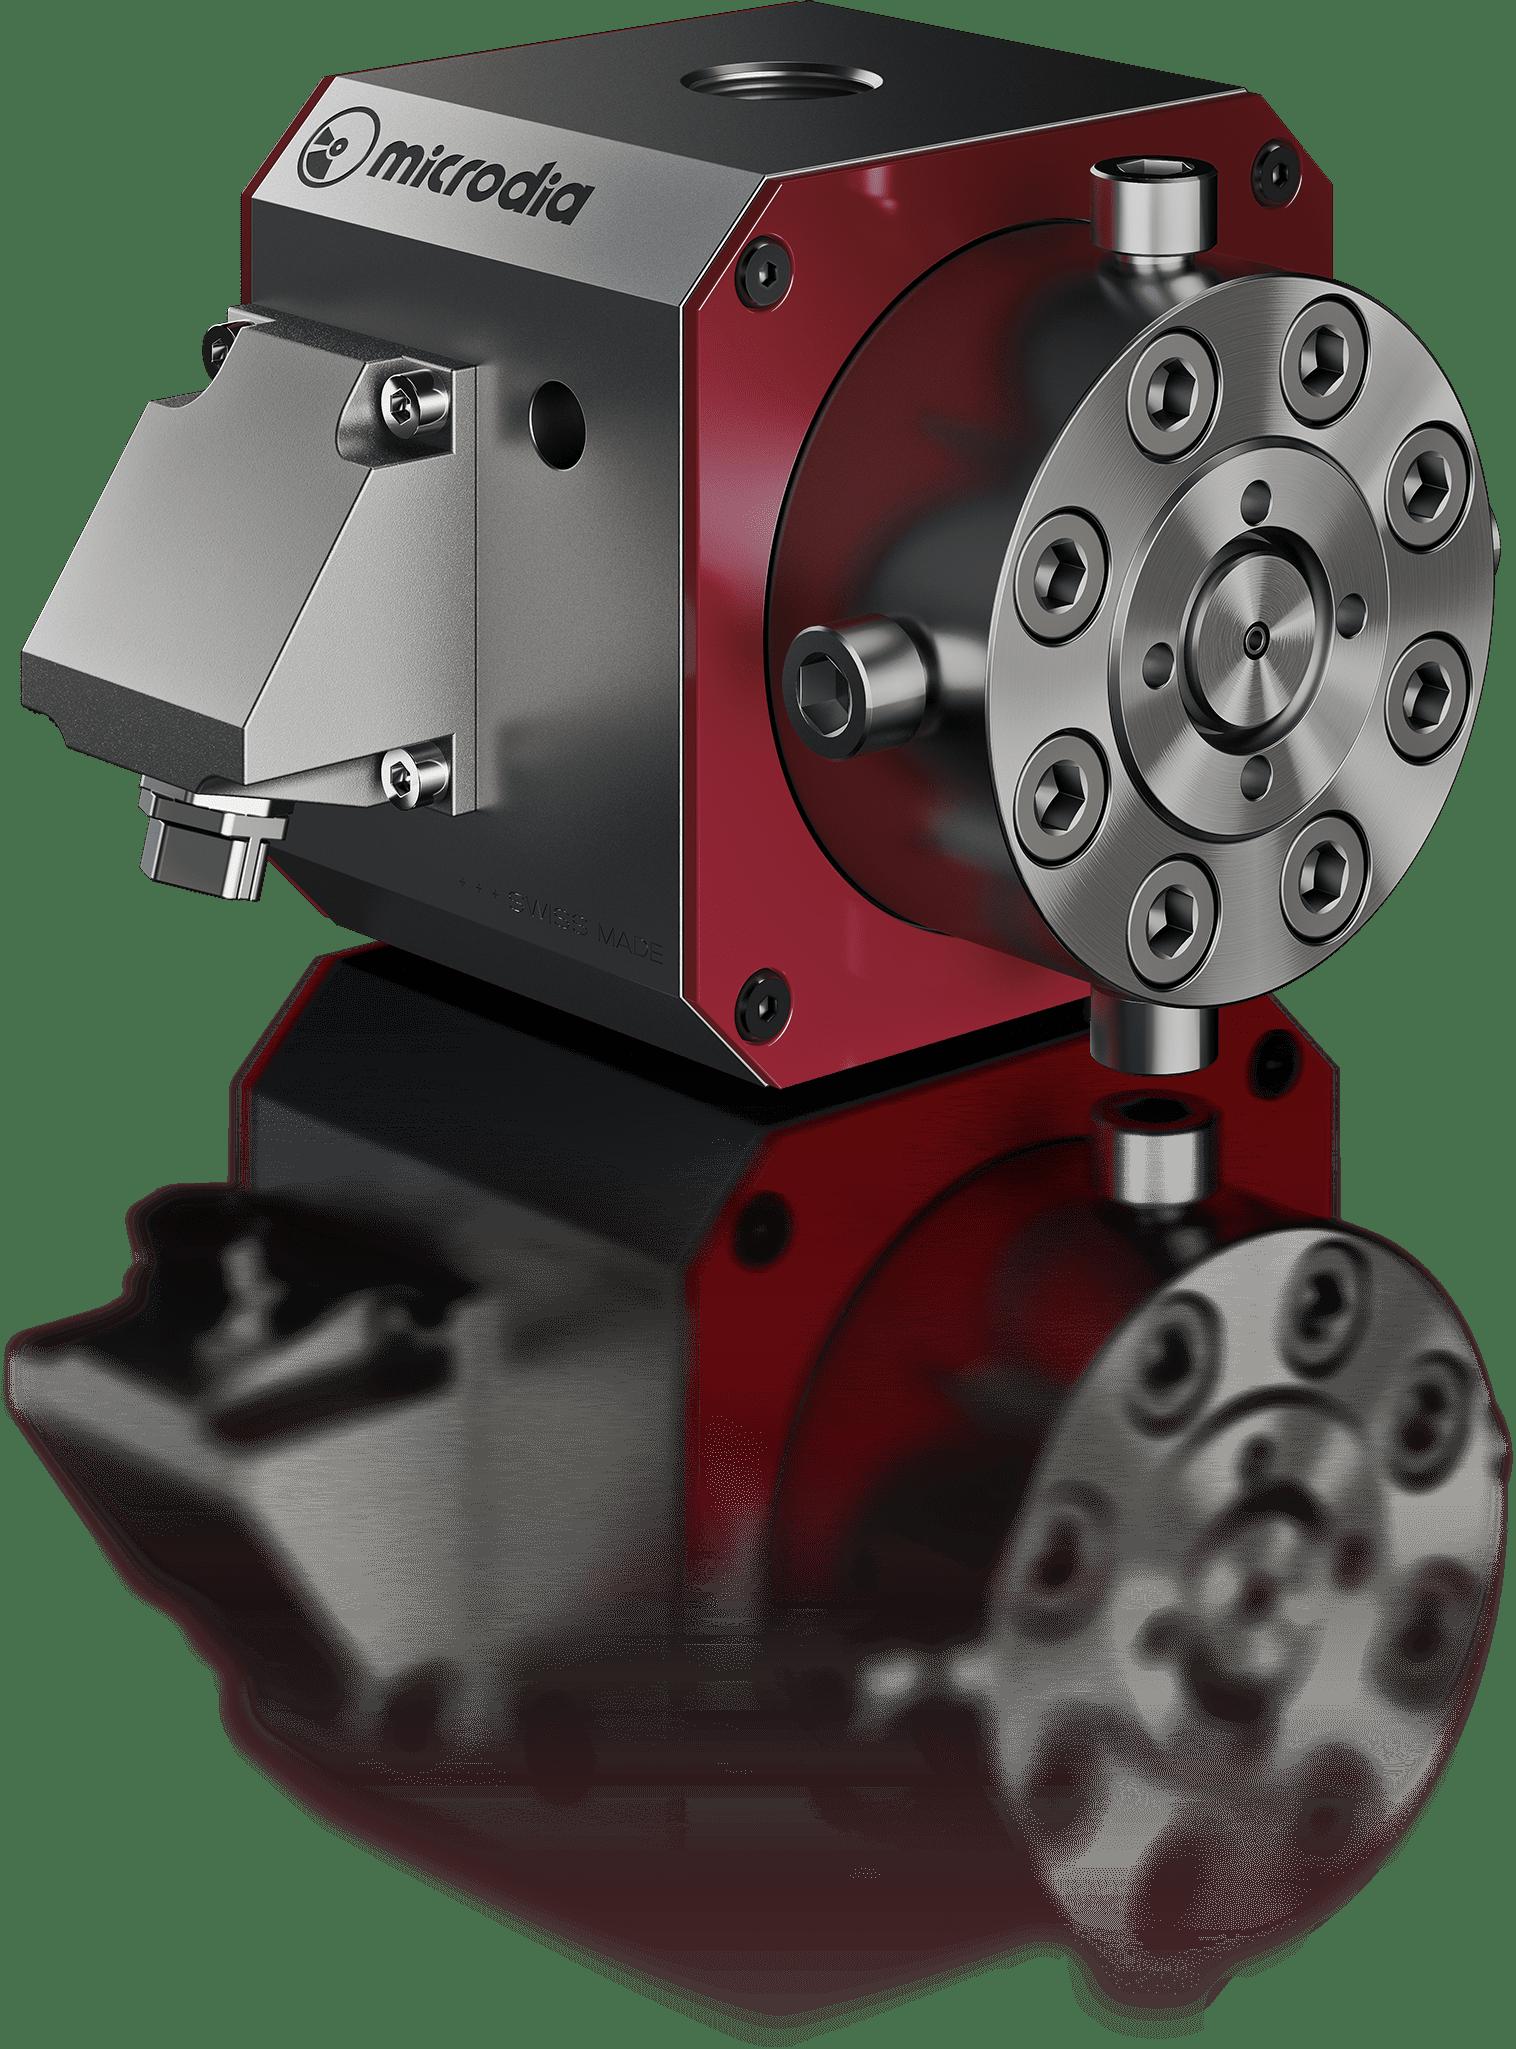 microdia-product-image